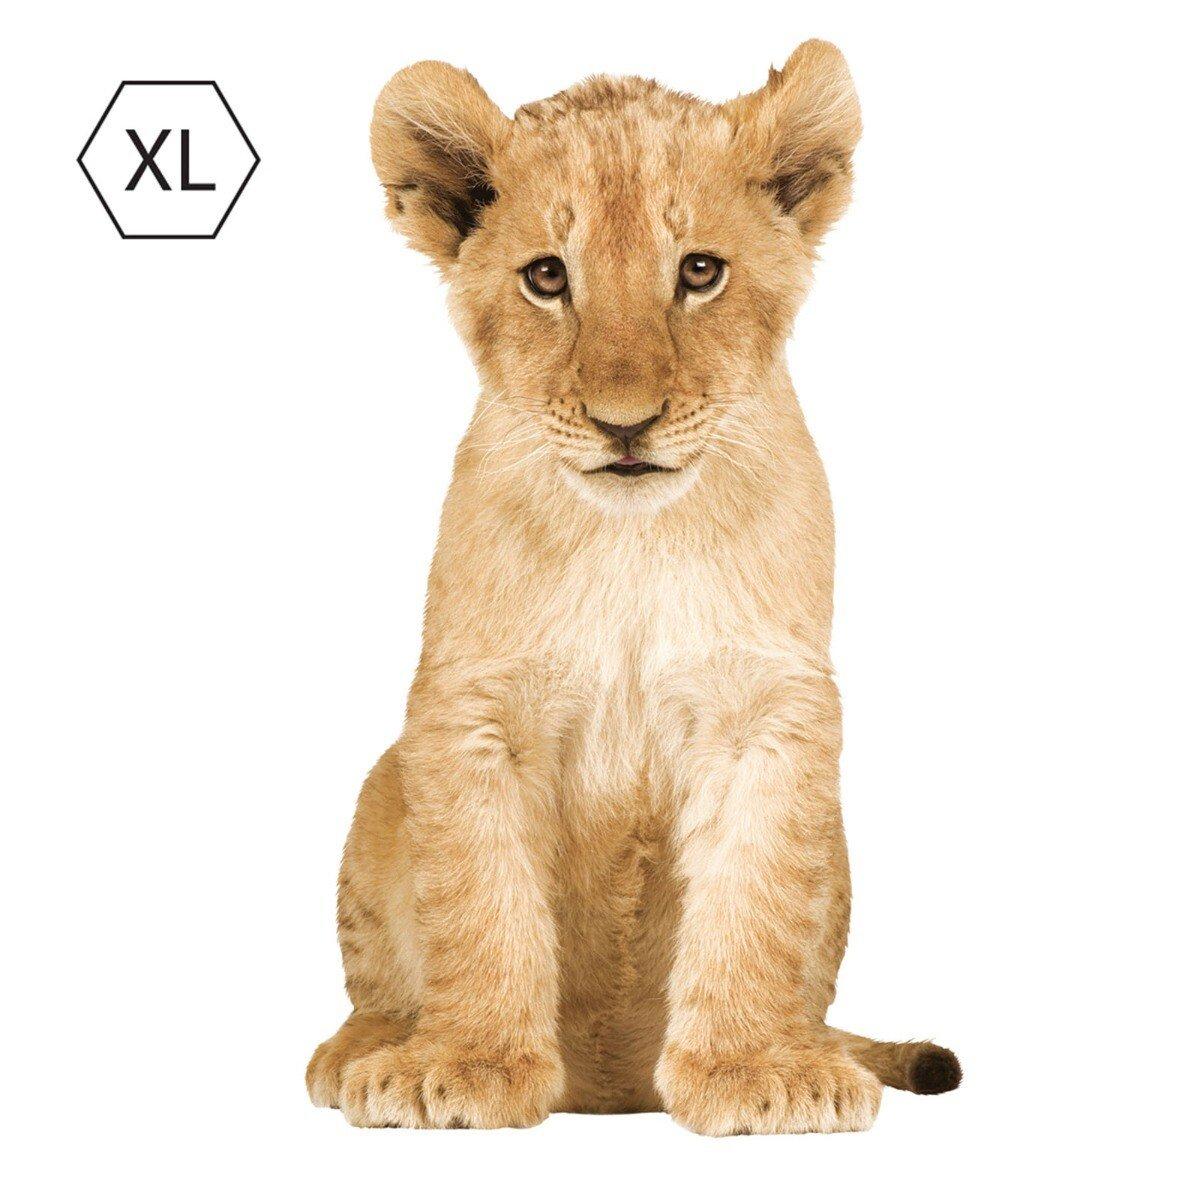 KEK Amsterdam Safari Friends Muursticker XL Leeuwenwelp